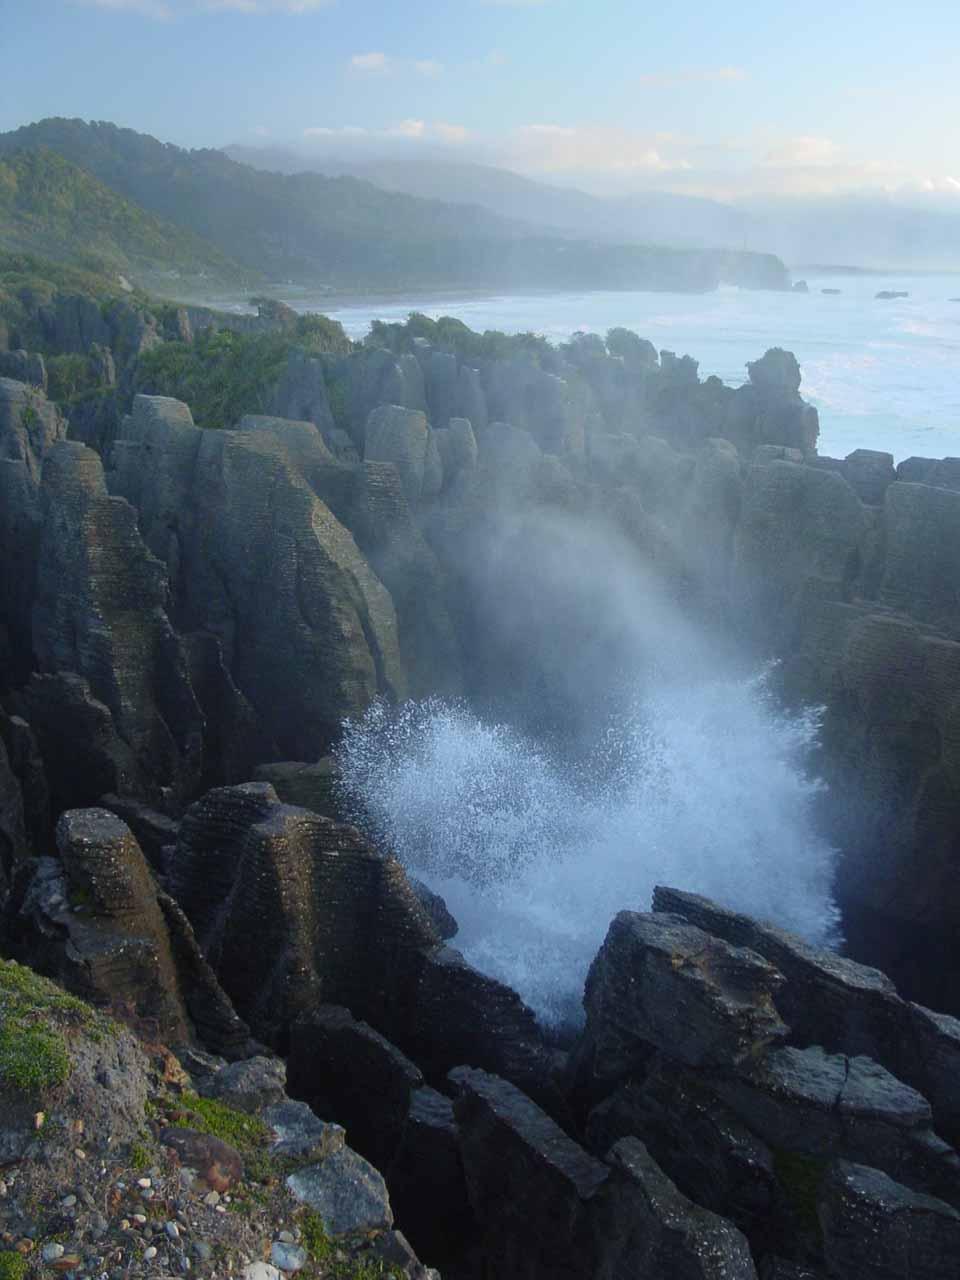 Putai Blowhole and the Pancake Rocks